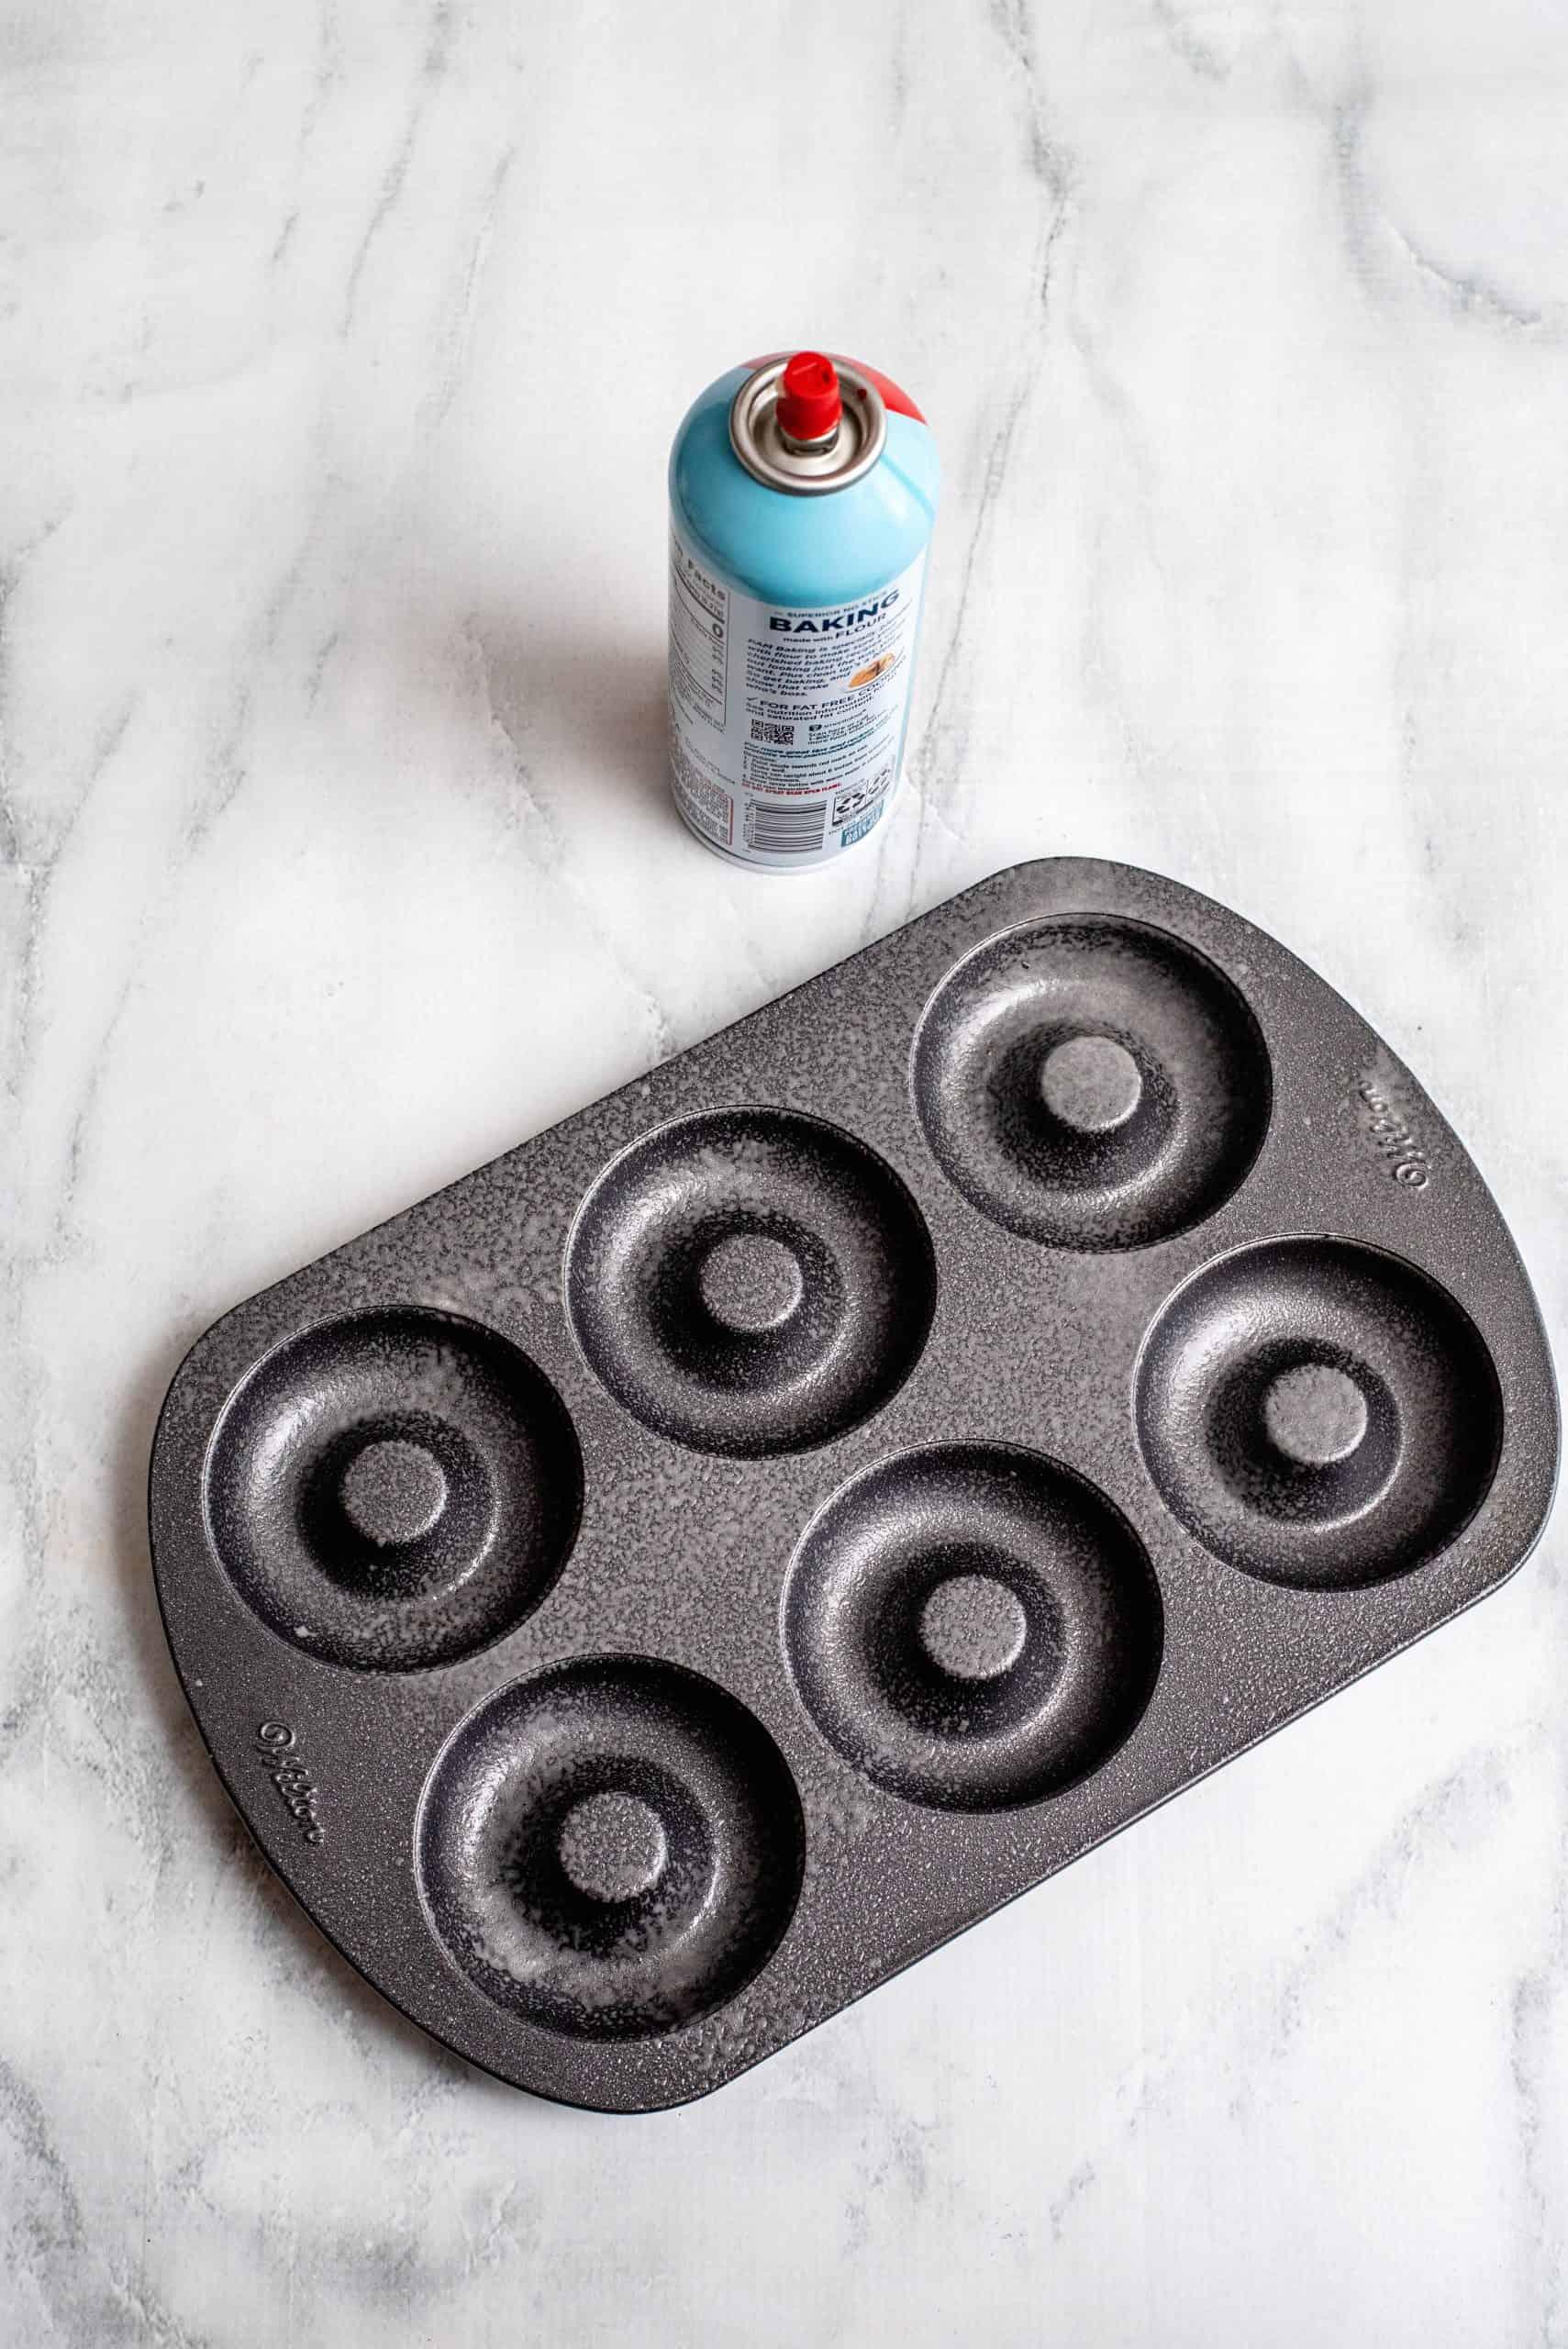 Donut pan sprayed with cooking spray